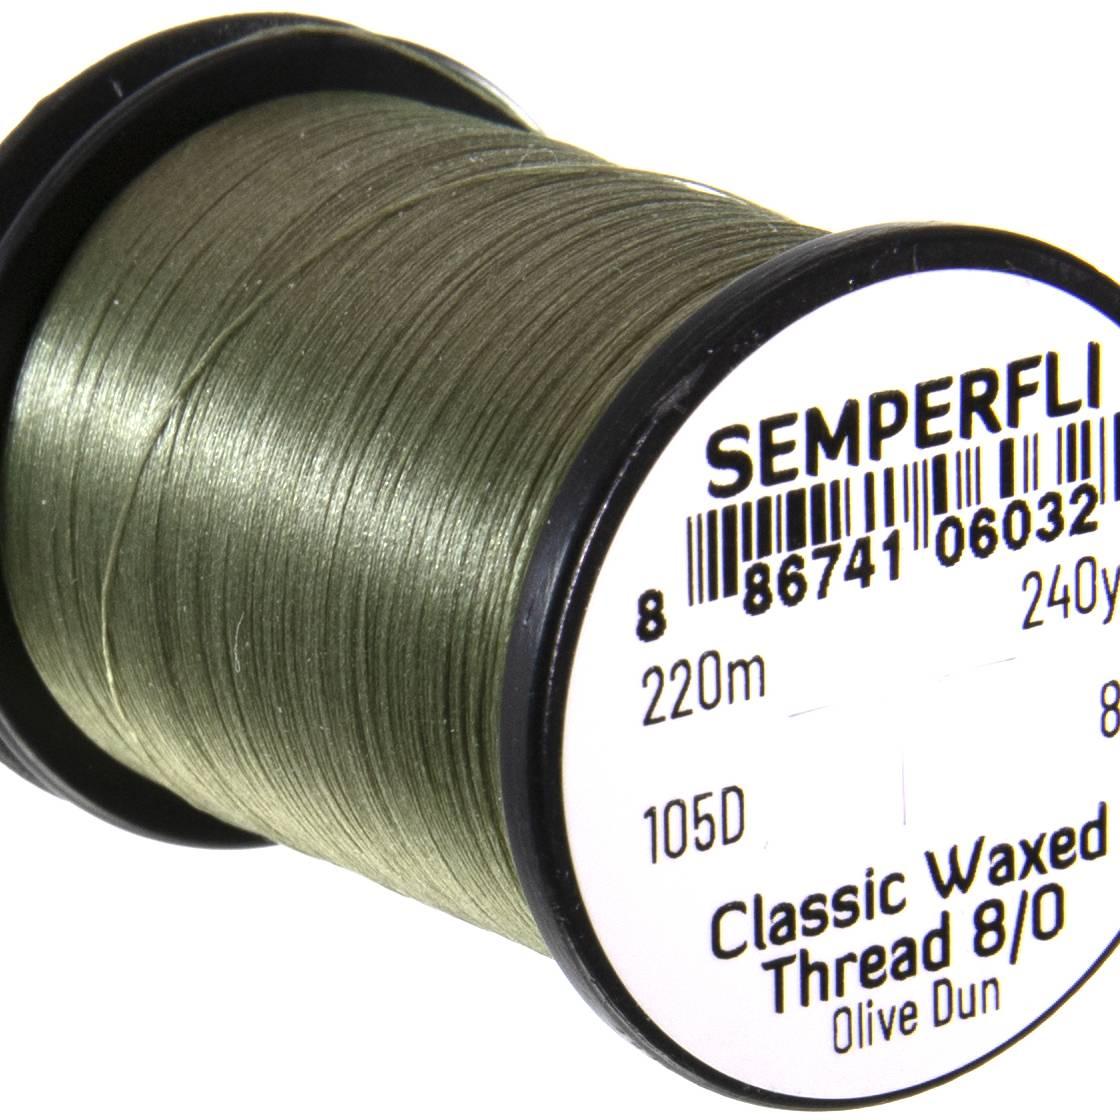 Semperfli Classic Waxed Thread 8/0 240 Yards Olive Dun